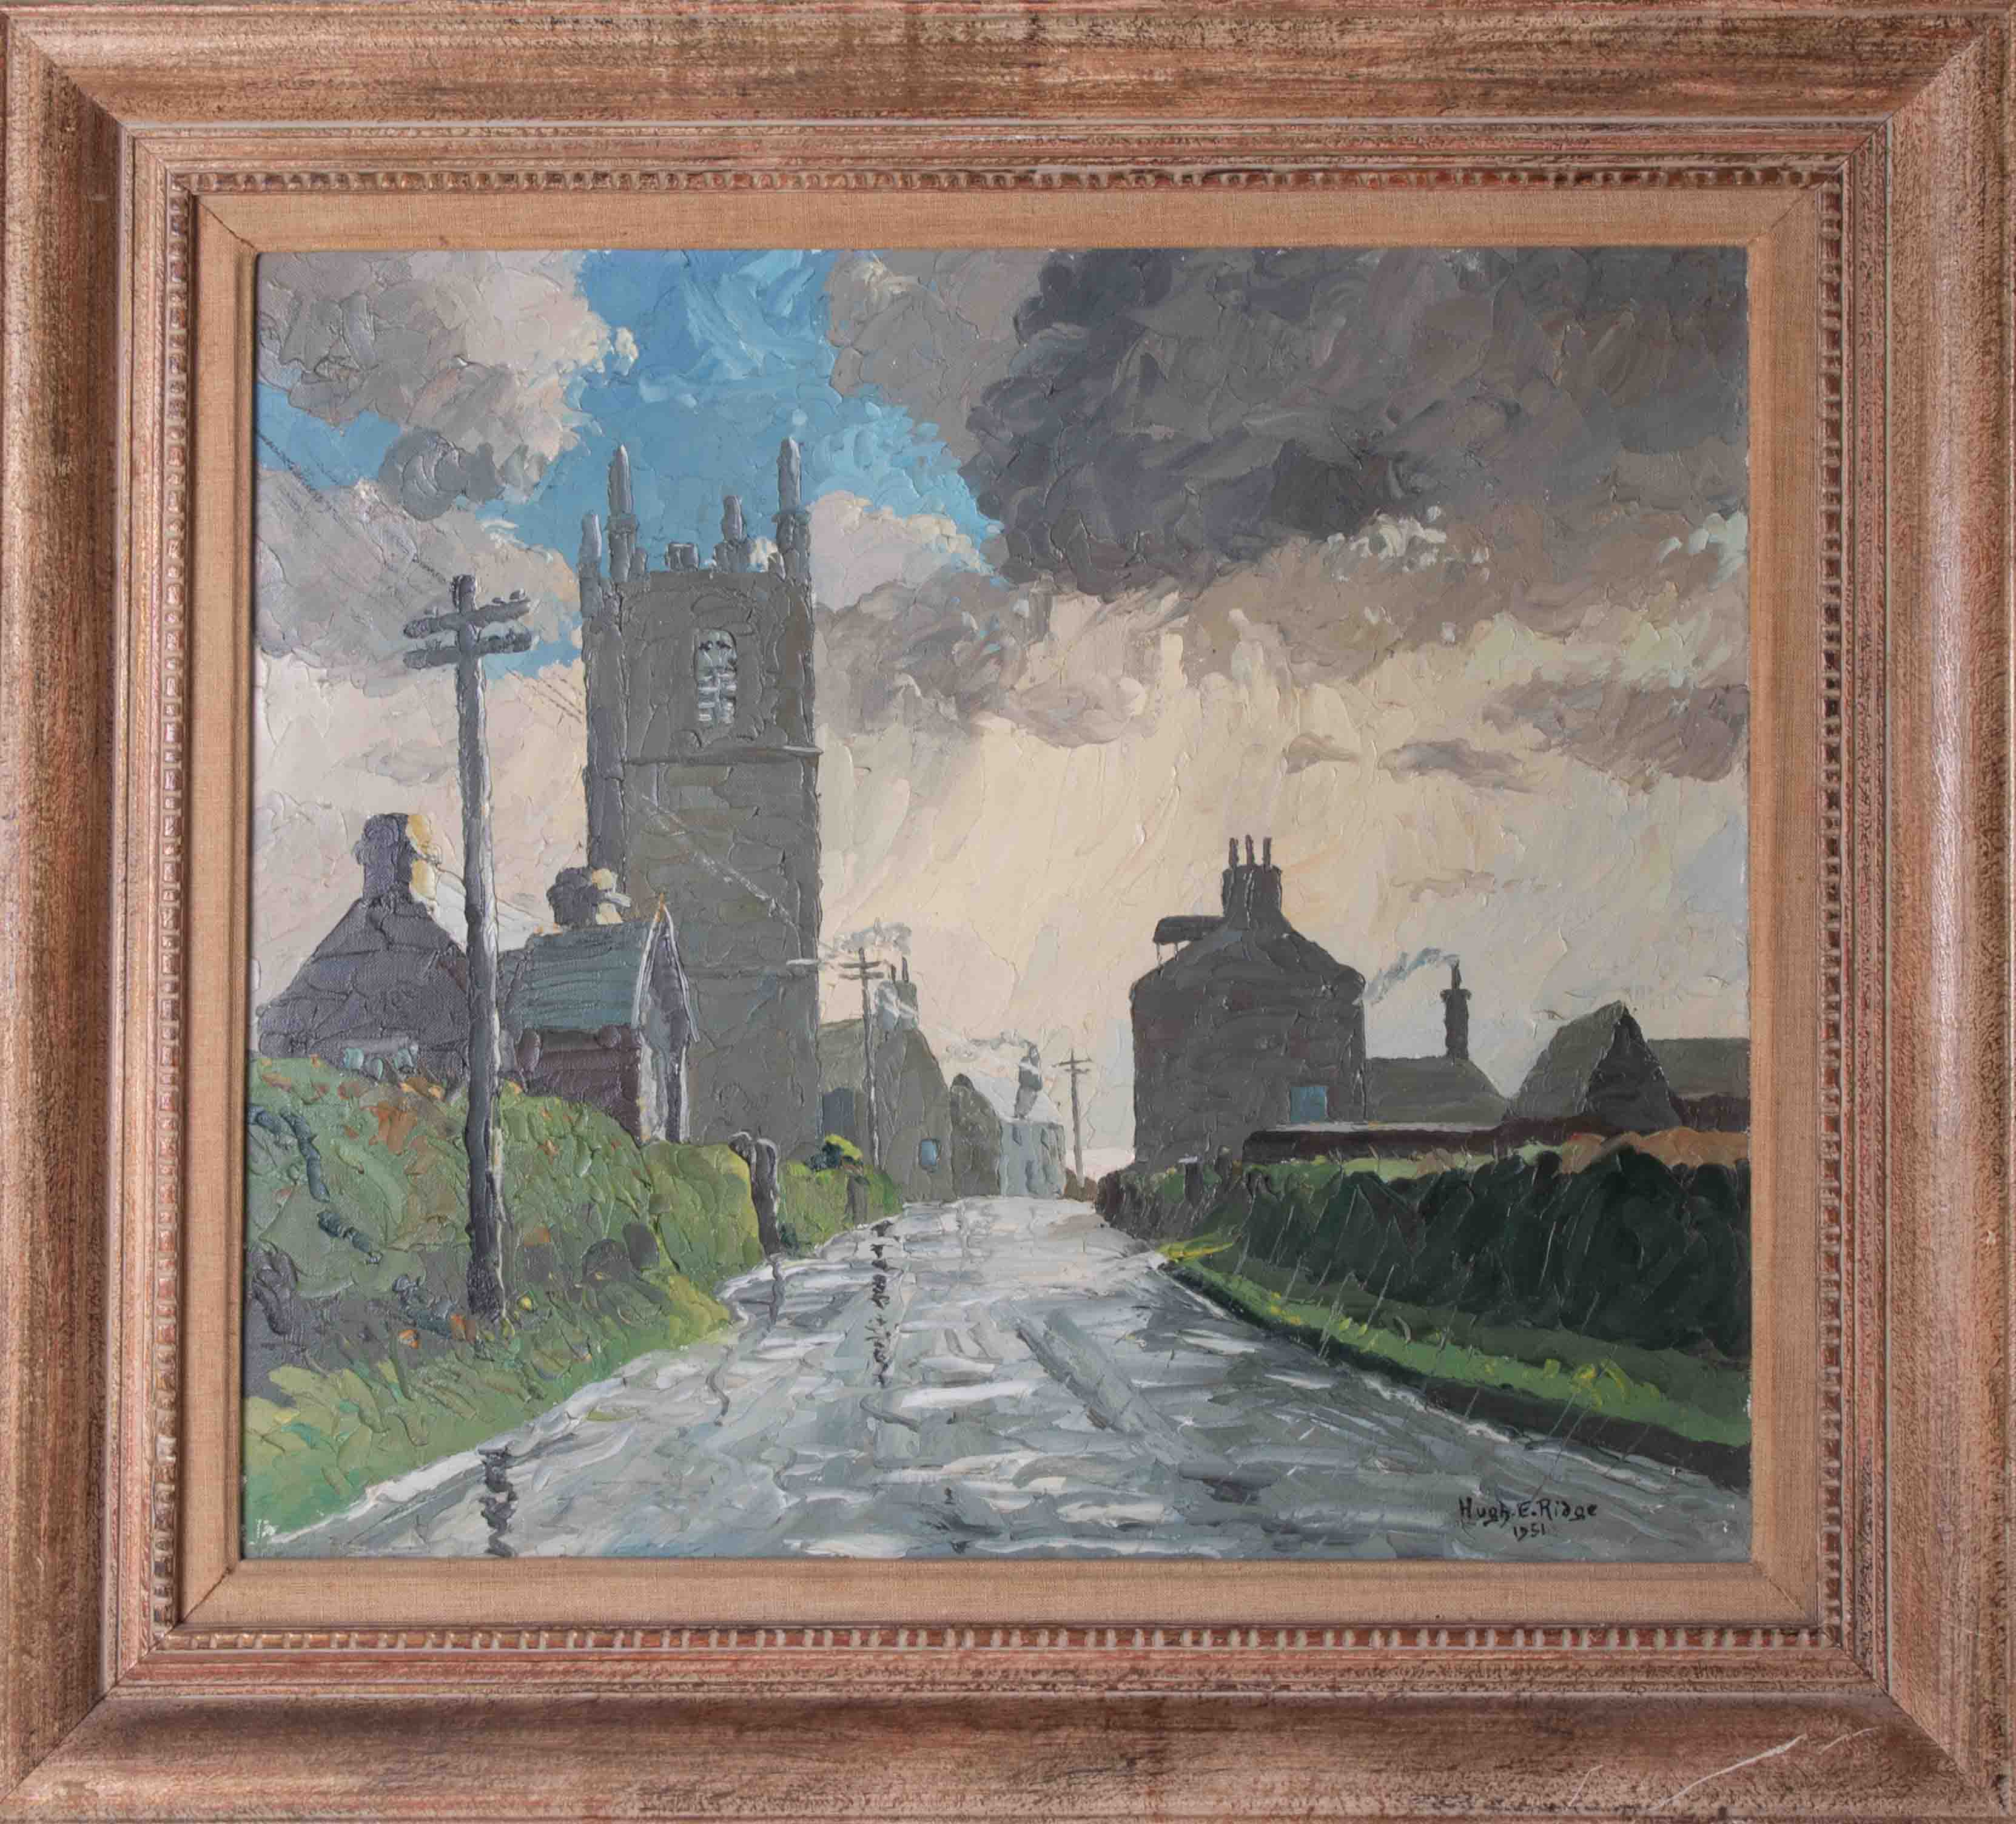 Hugh E Ridge (1899-1976) 'December Day, Sennen' signed oil on canvas, 38cm x 43cm, Exhibitors Back